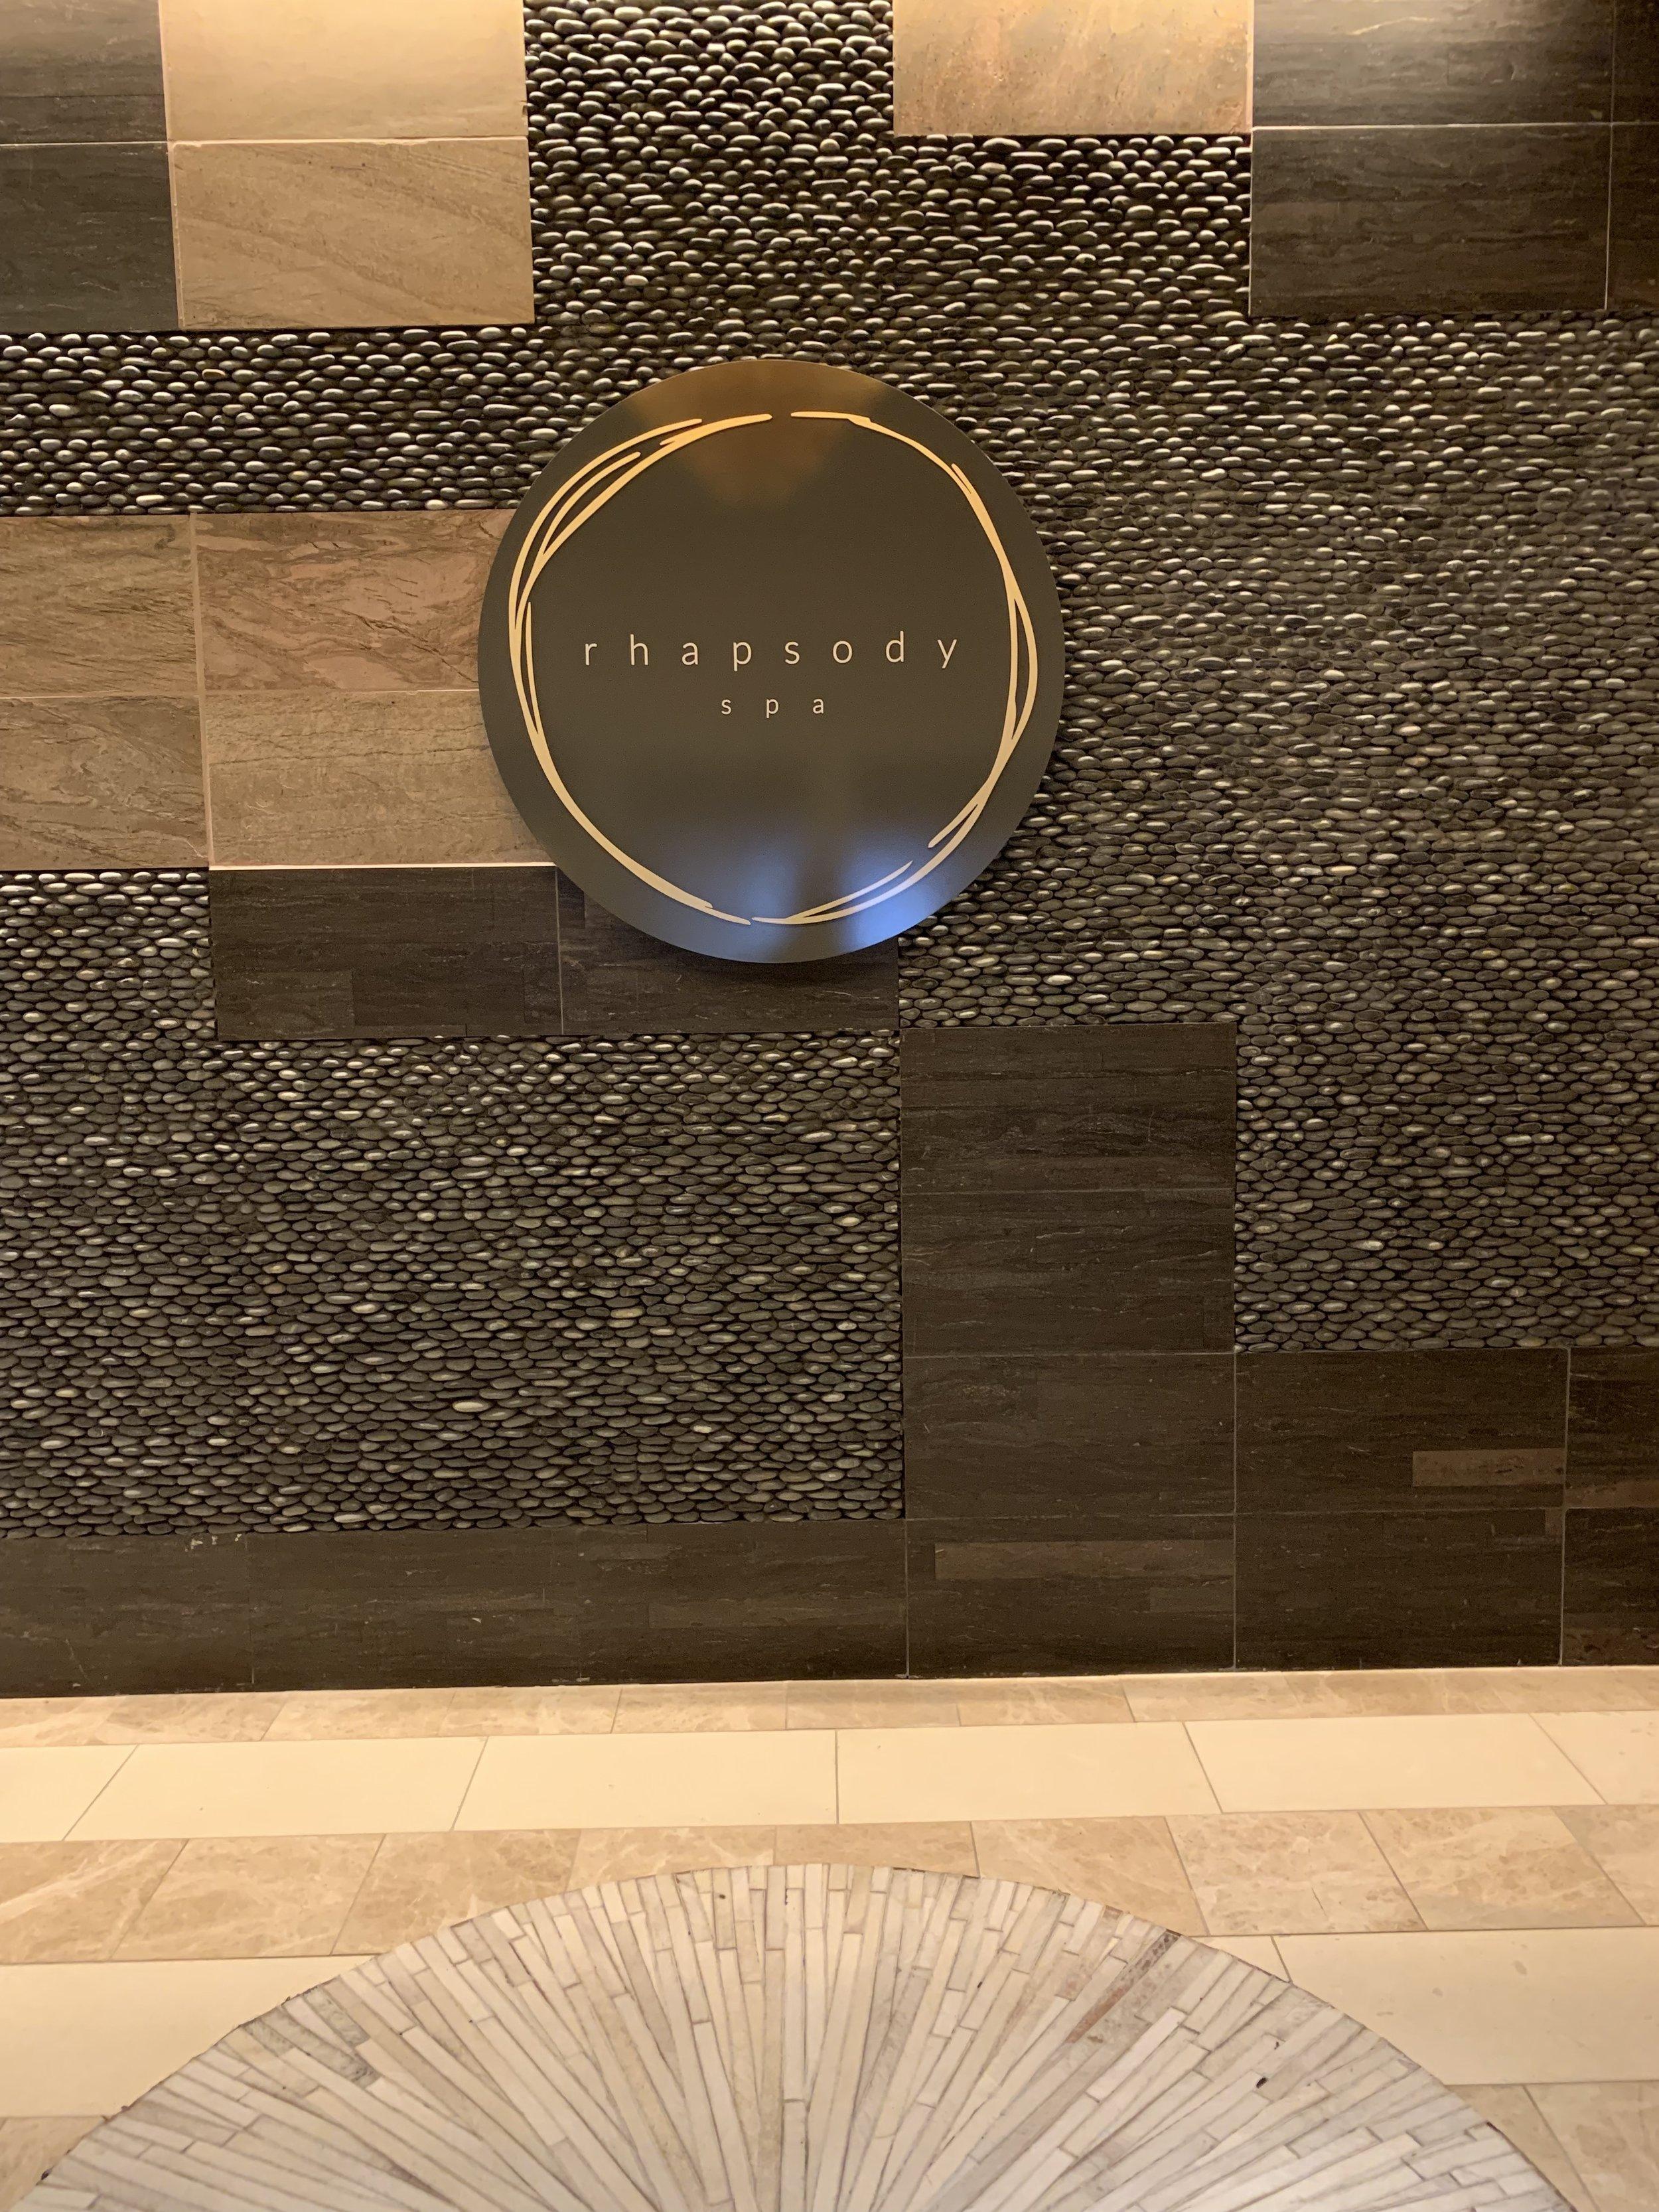 Rhapsody Spa- inside of the Westin Nashville hotel, downtown